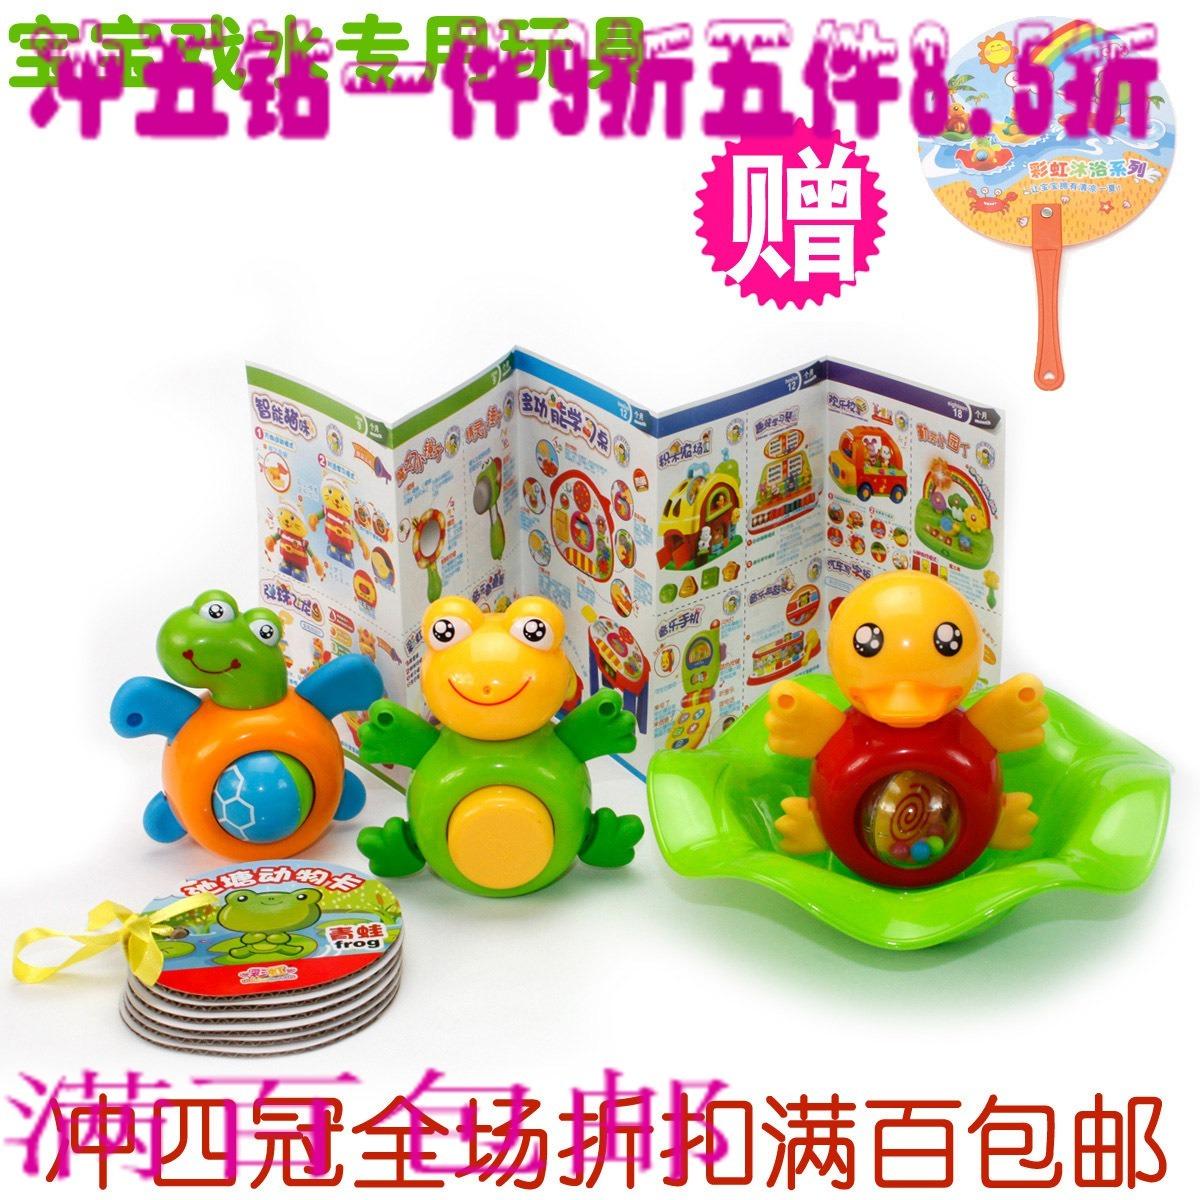 frog bathroom set - kraisee